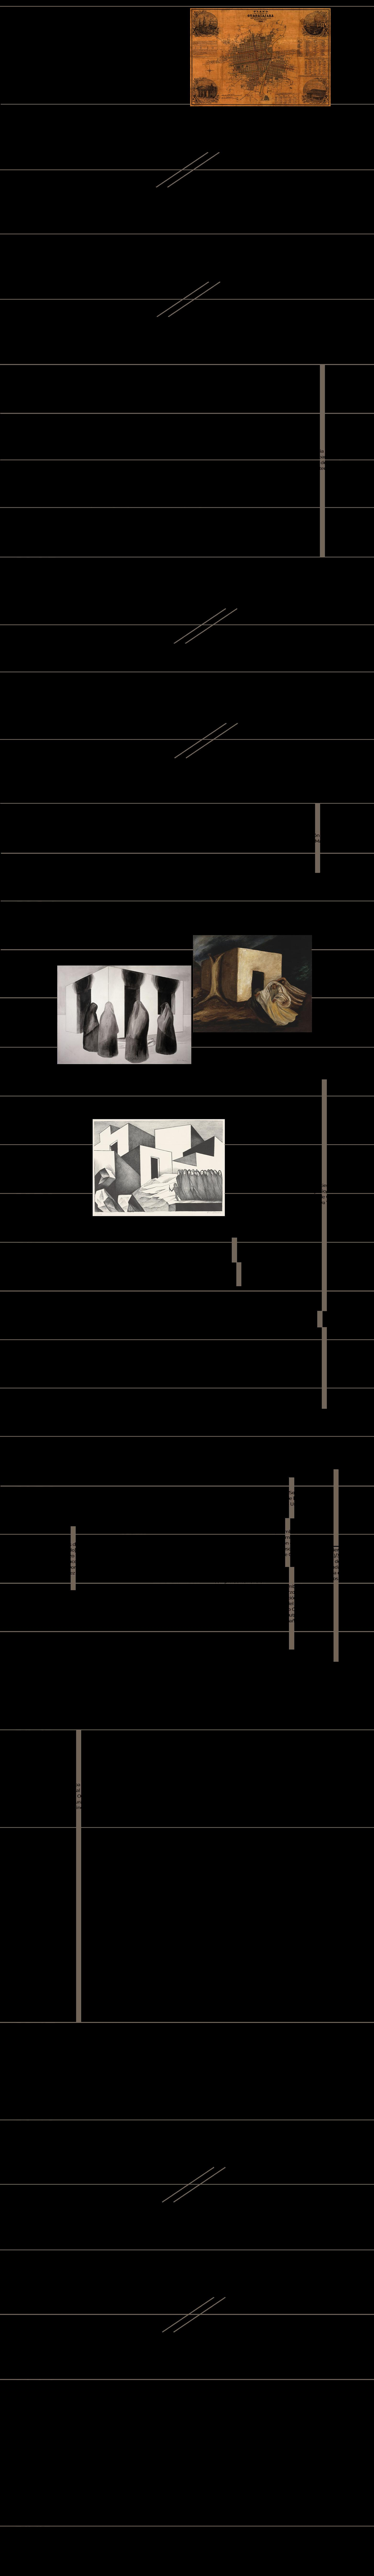 Lineadeltiempo-FINAL-191209-20dic